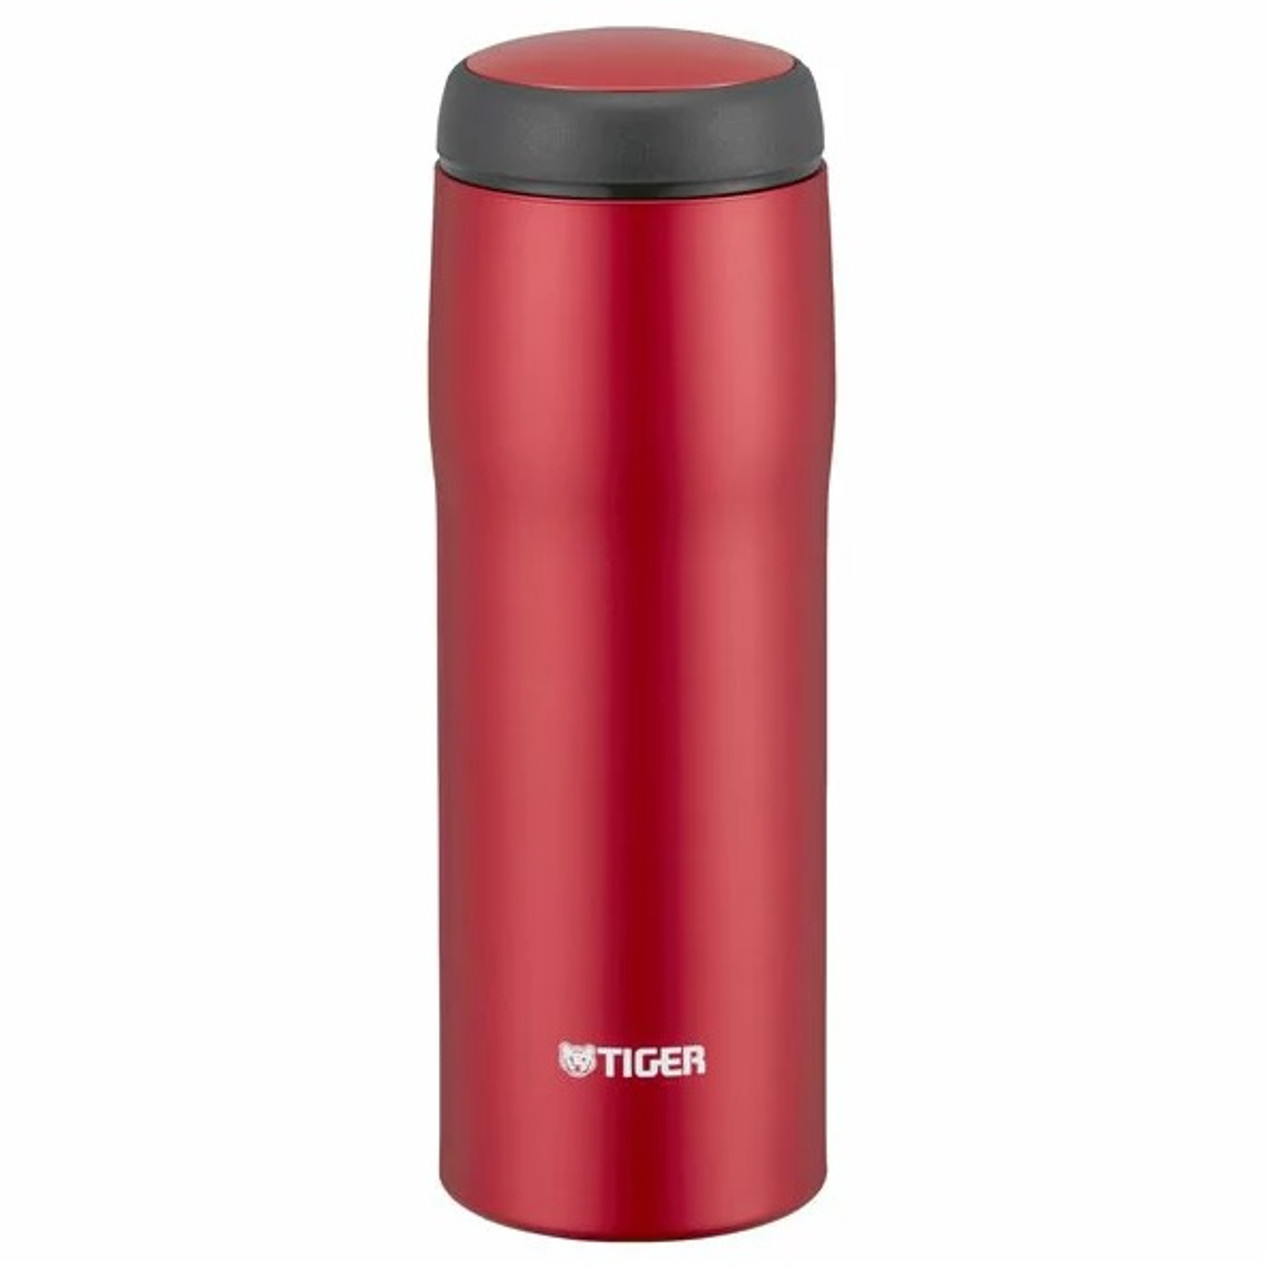 Tiger Stainless Steel 0.48L Mug Bottle MJA-B048 Red